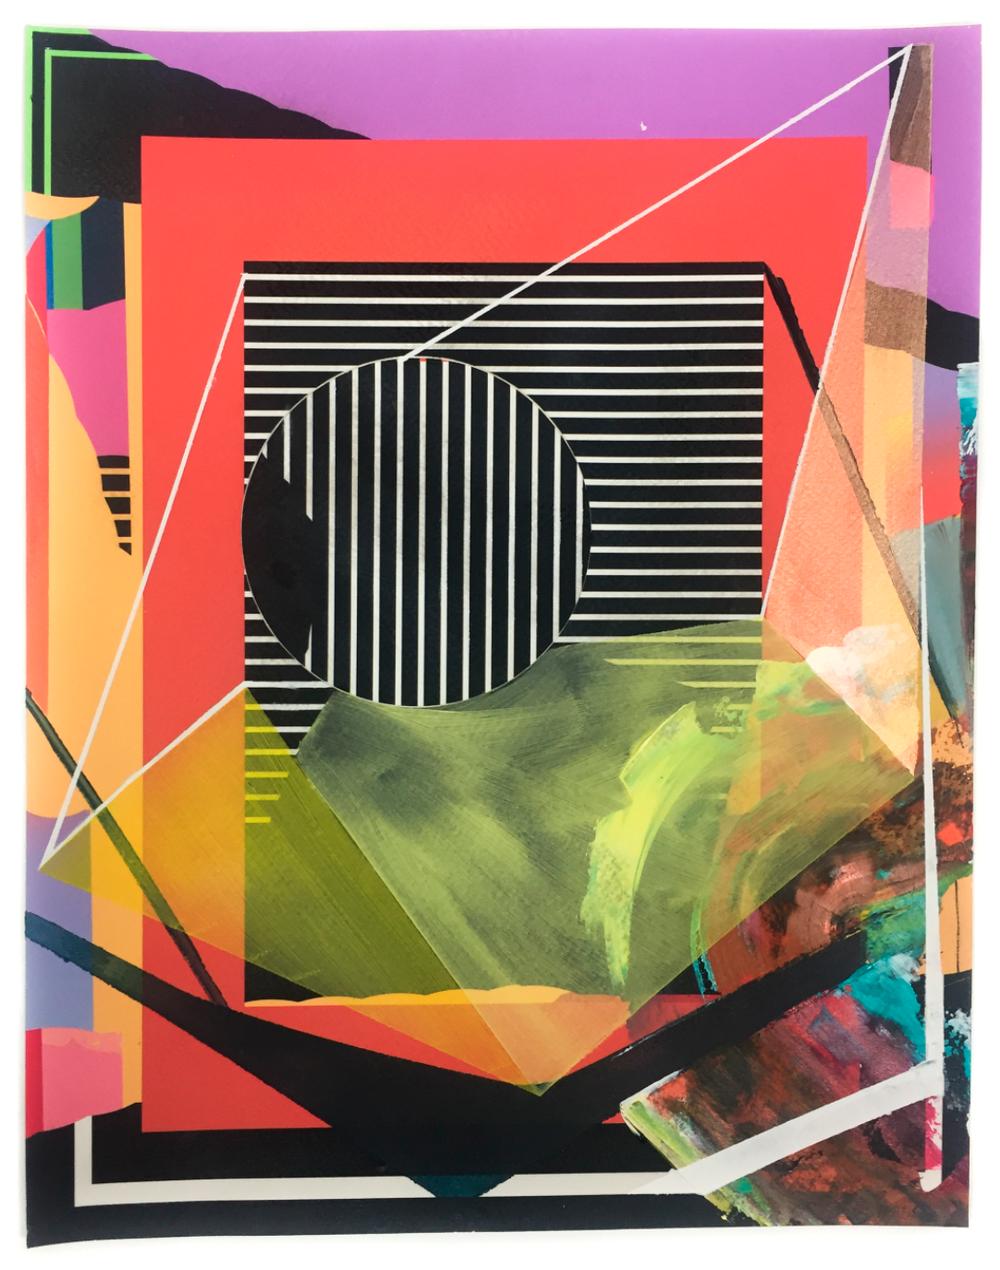 IRSKIY x JENNIFFER OMAITZ - Acrylic on Giclee Print2017